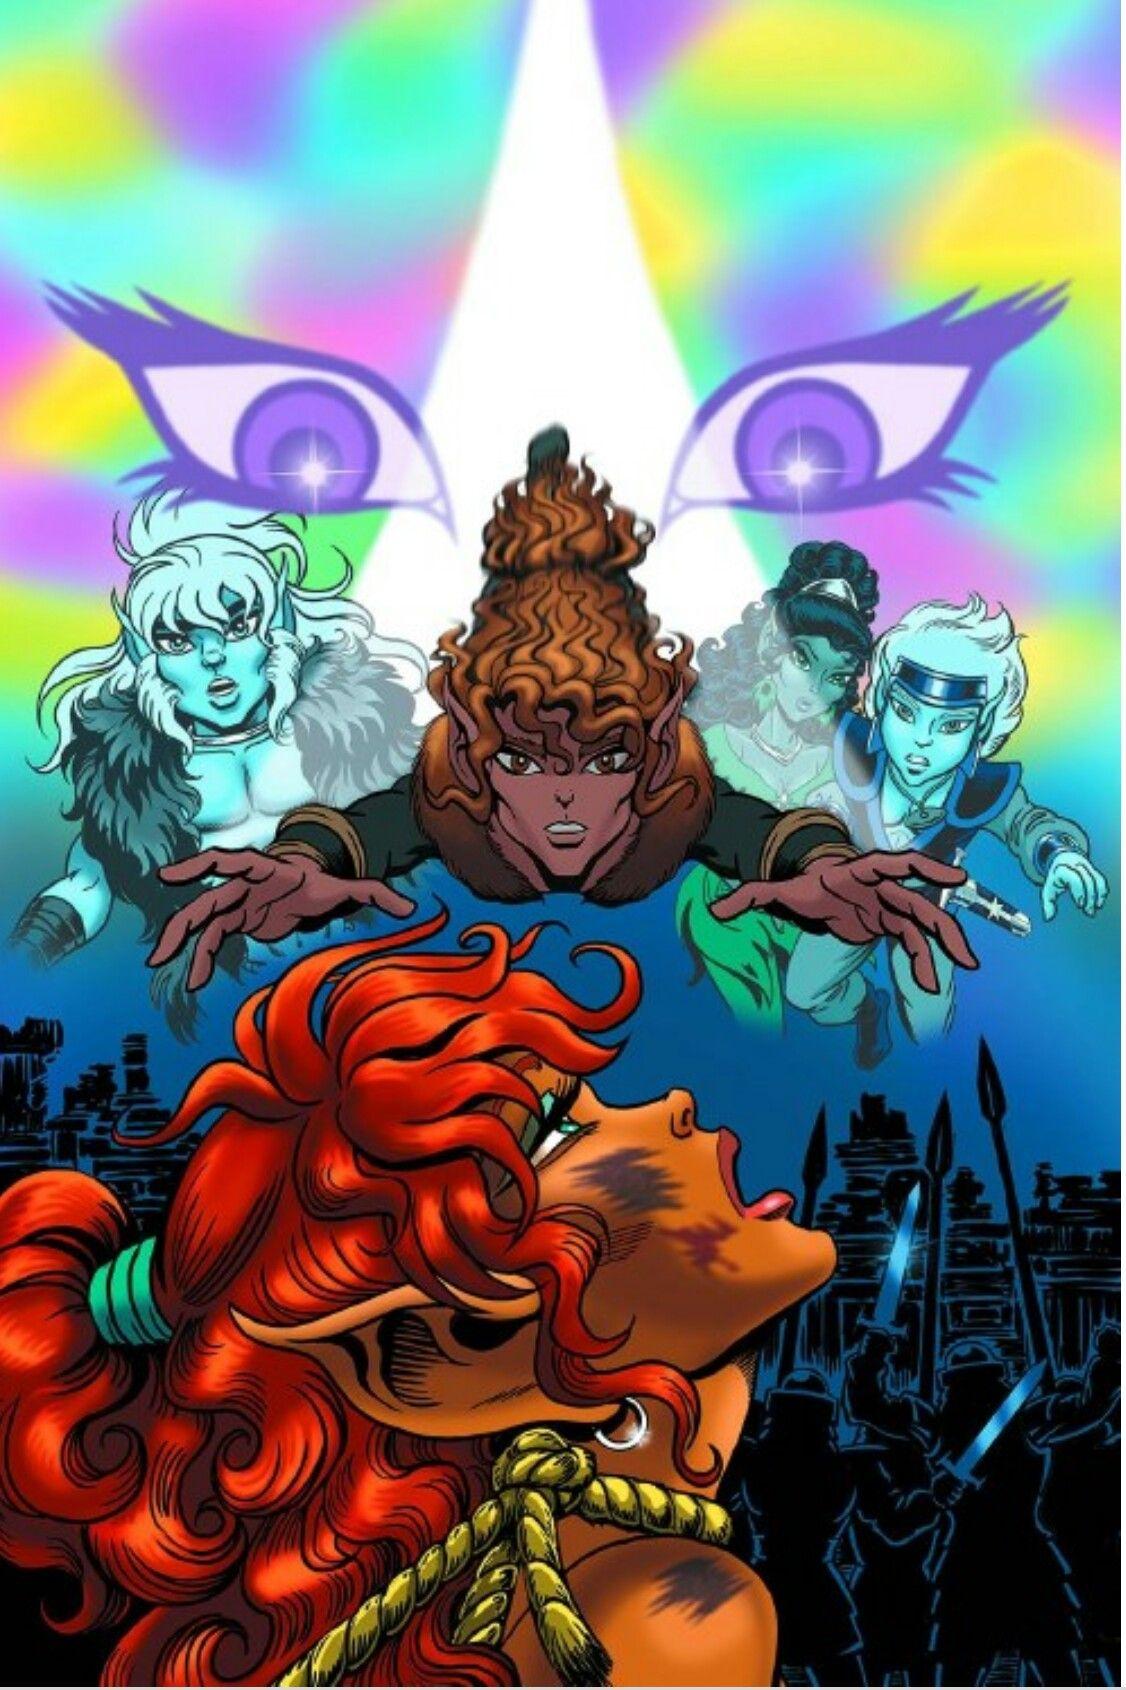 Pin by Desert Rose on ElfQuest   Graphic novel art, Dark horse comics, Dark horse